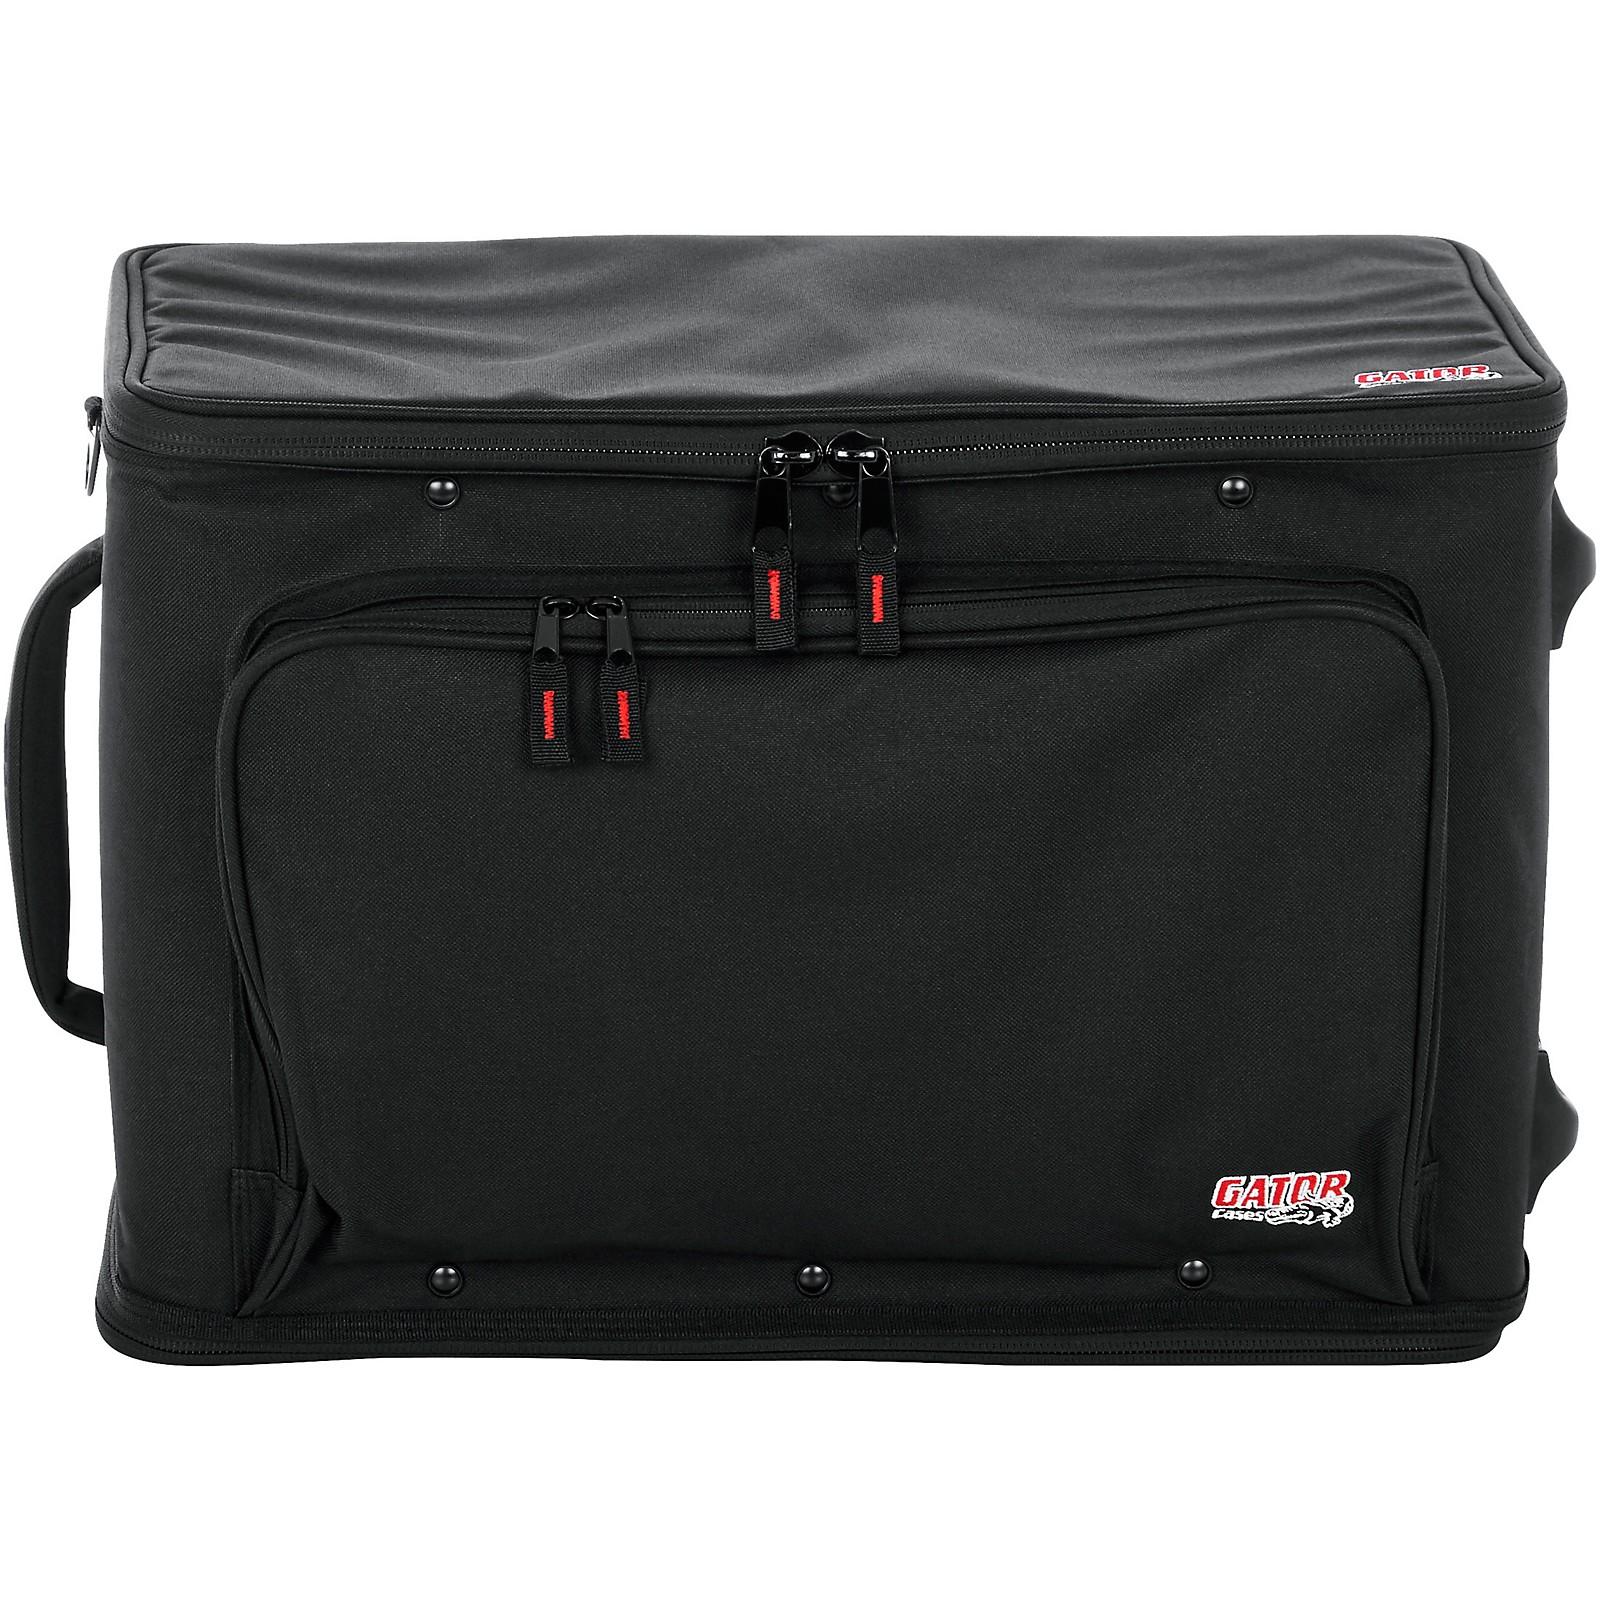 Gator GR-Rack Bag with Wheels